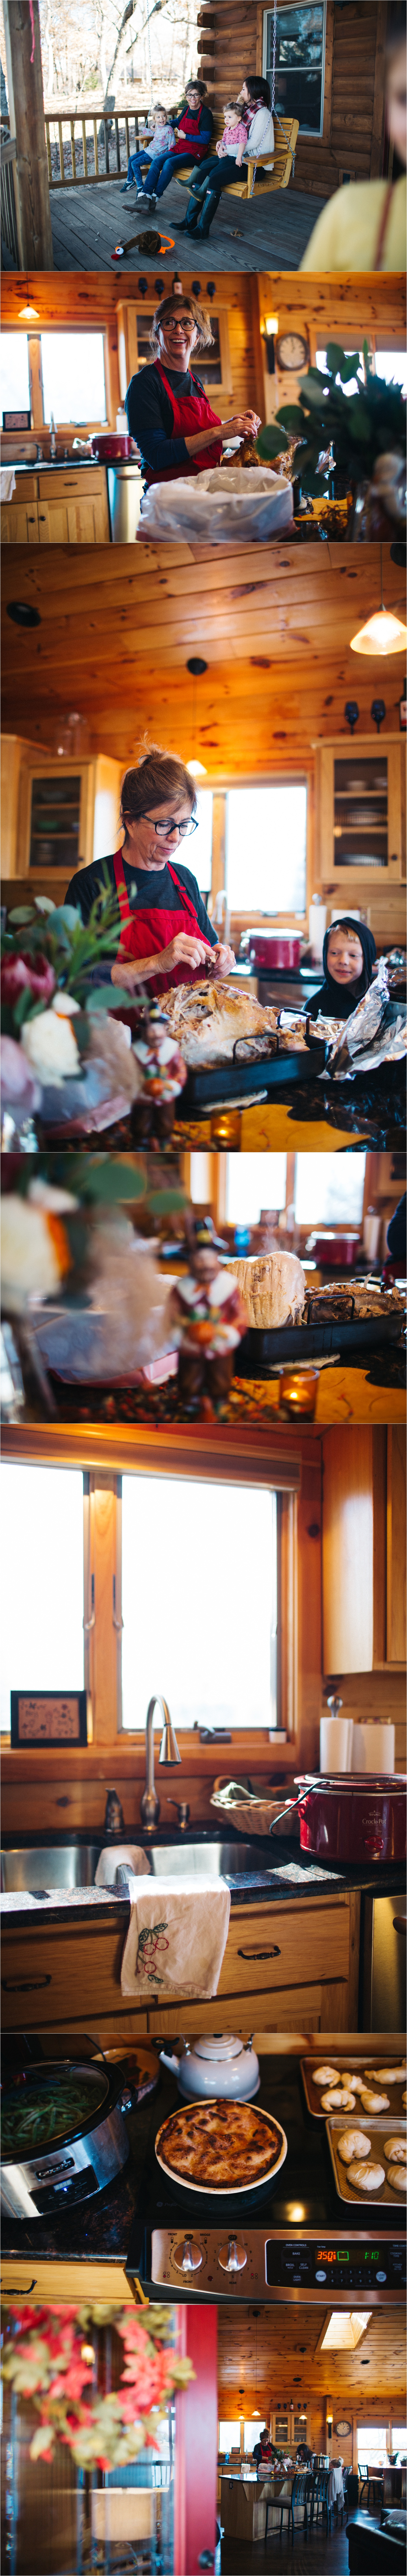 kansascitydocumentaryphotographer_0503.jpg